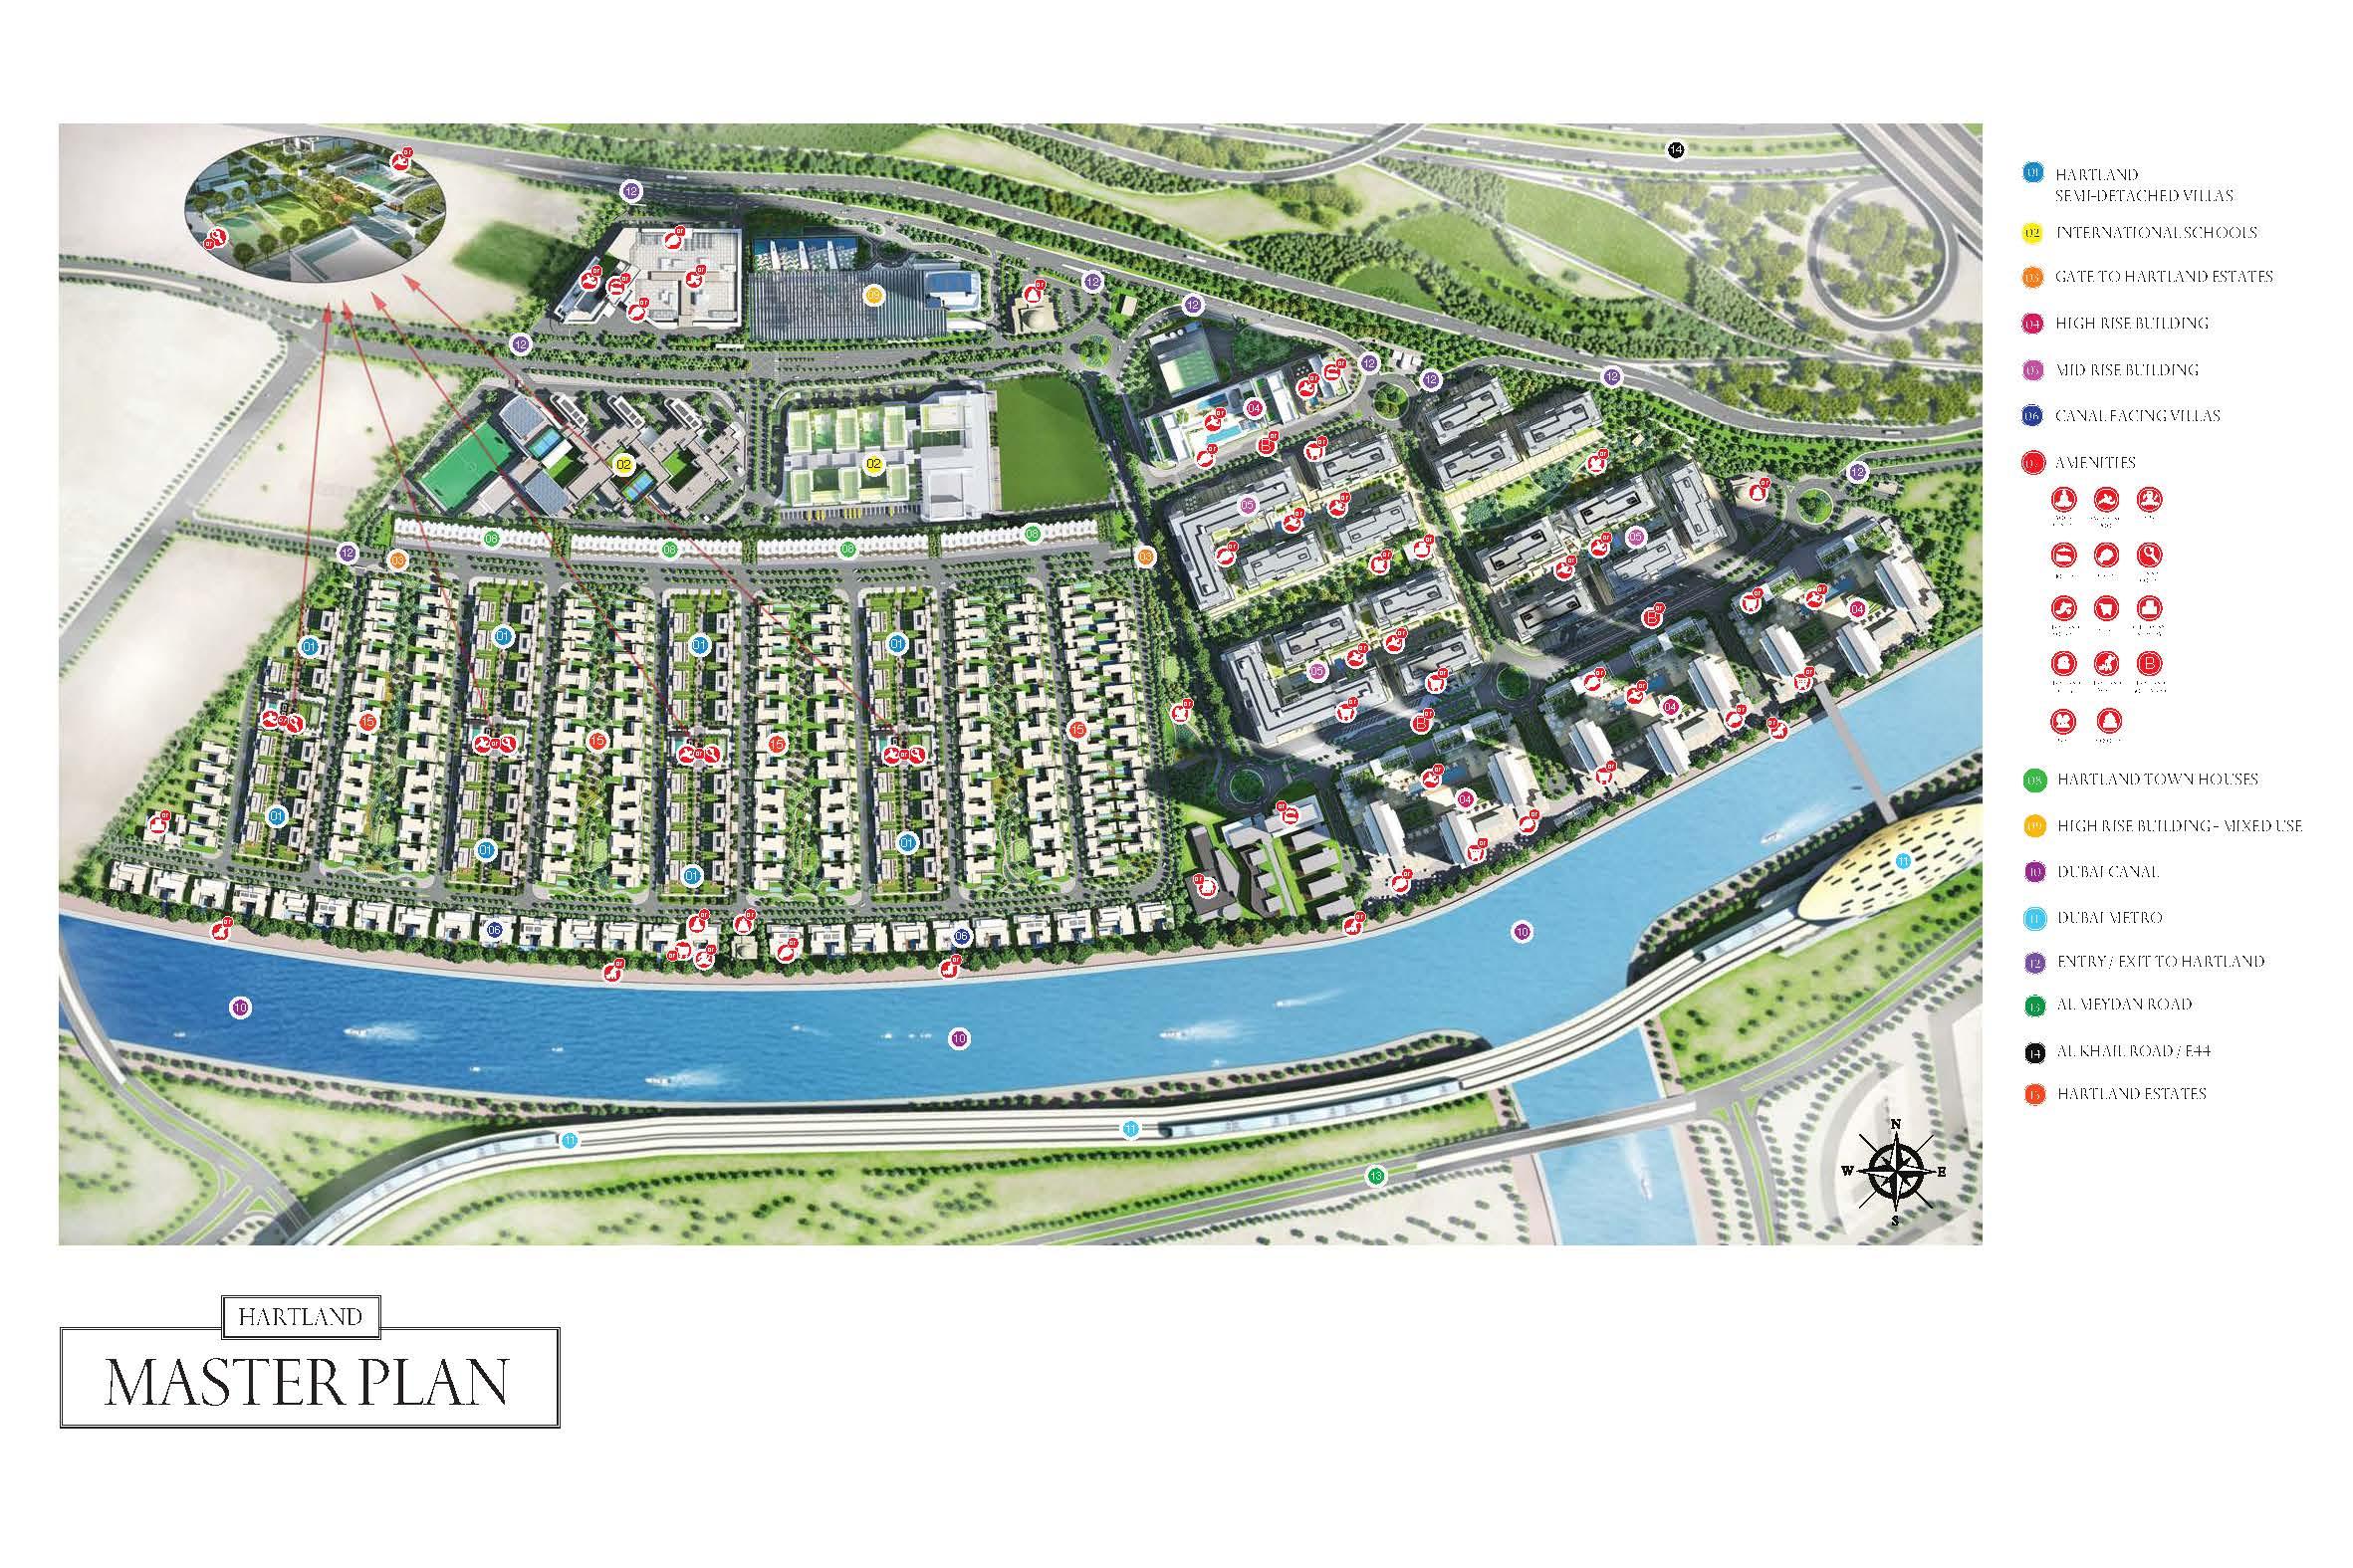 Sobha-Hartland-Estates Master Plan